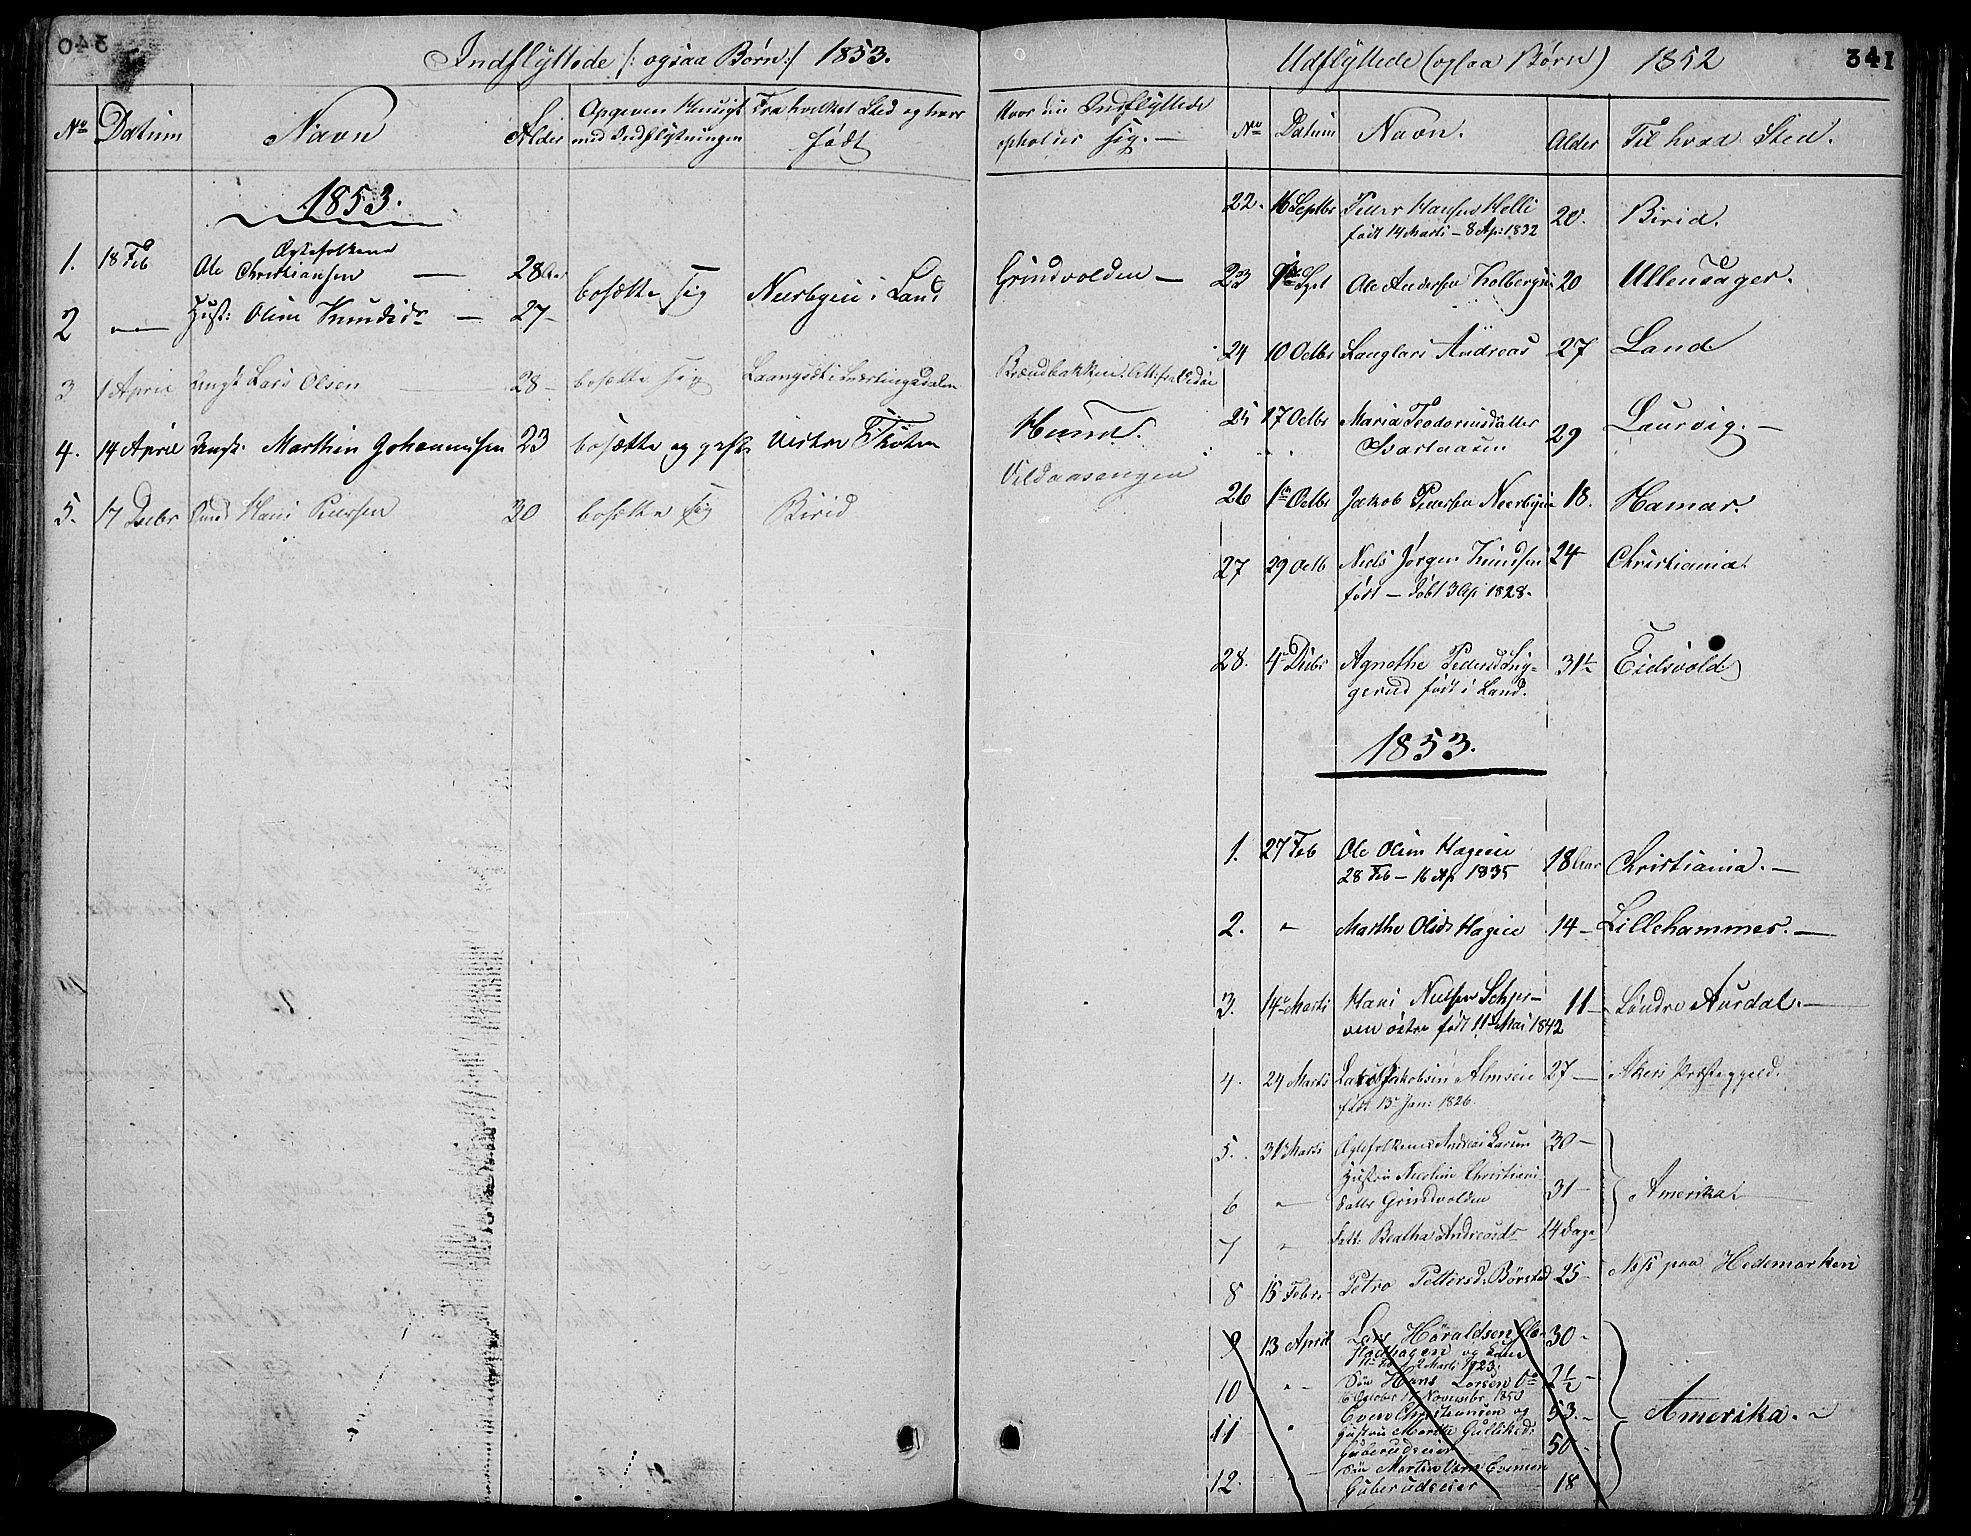 SAH, Vardal prestekontor, H/Ha/Hab/L0004: Klokkerbok nr. 4, 1831-1853, s. 341